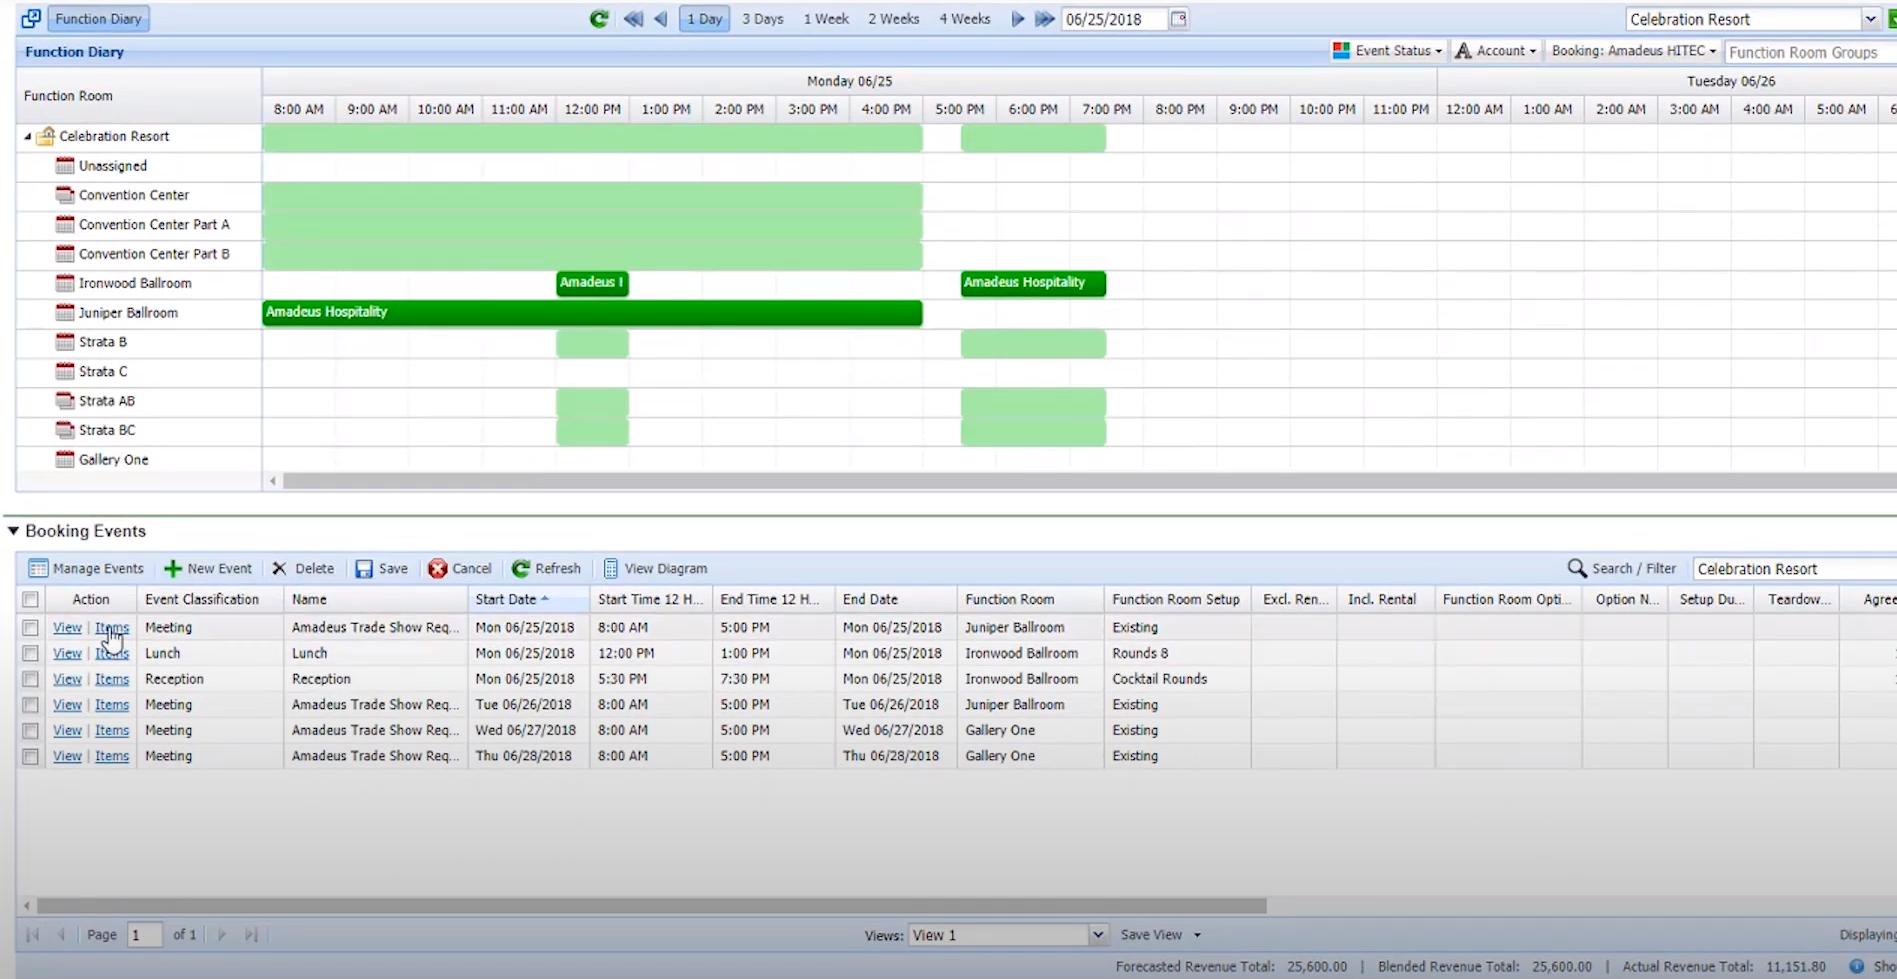 Amadeus Sales & Event Management function diary